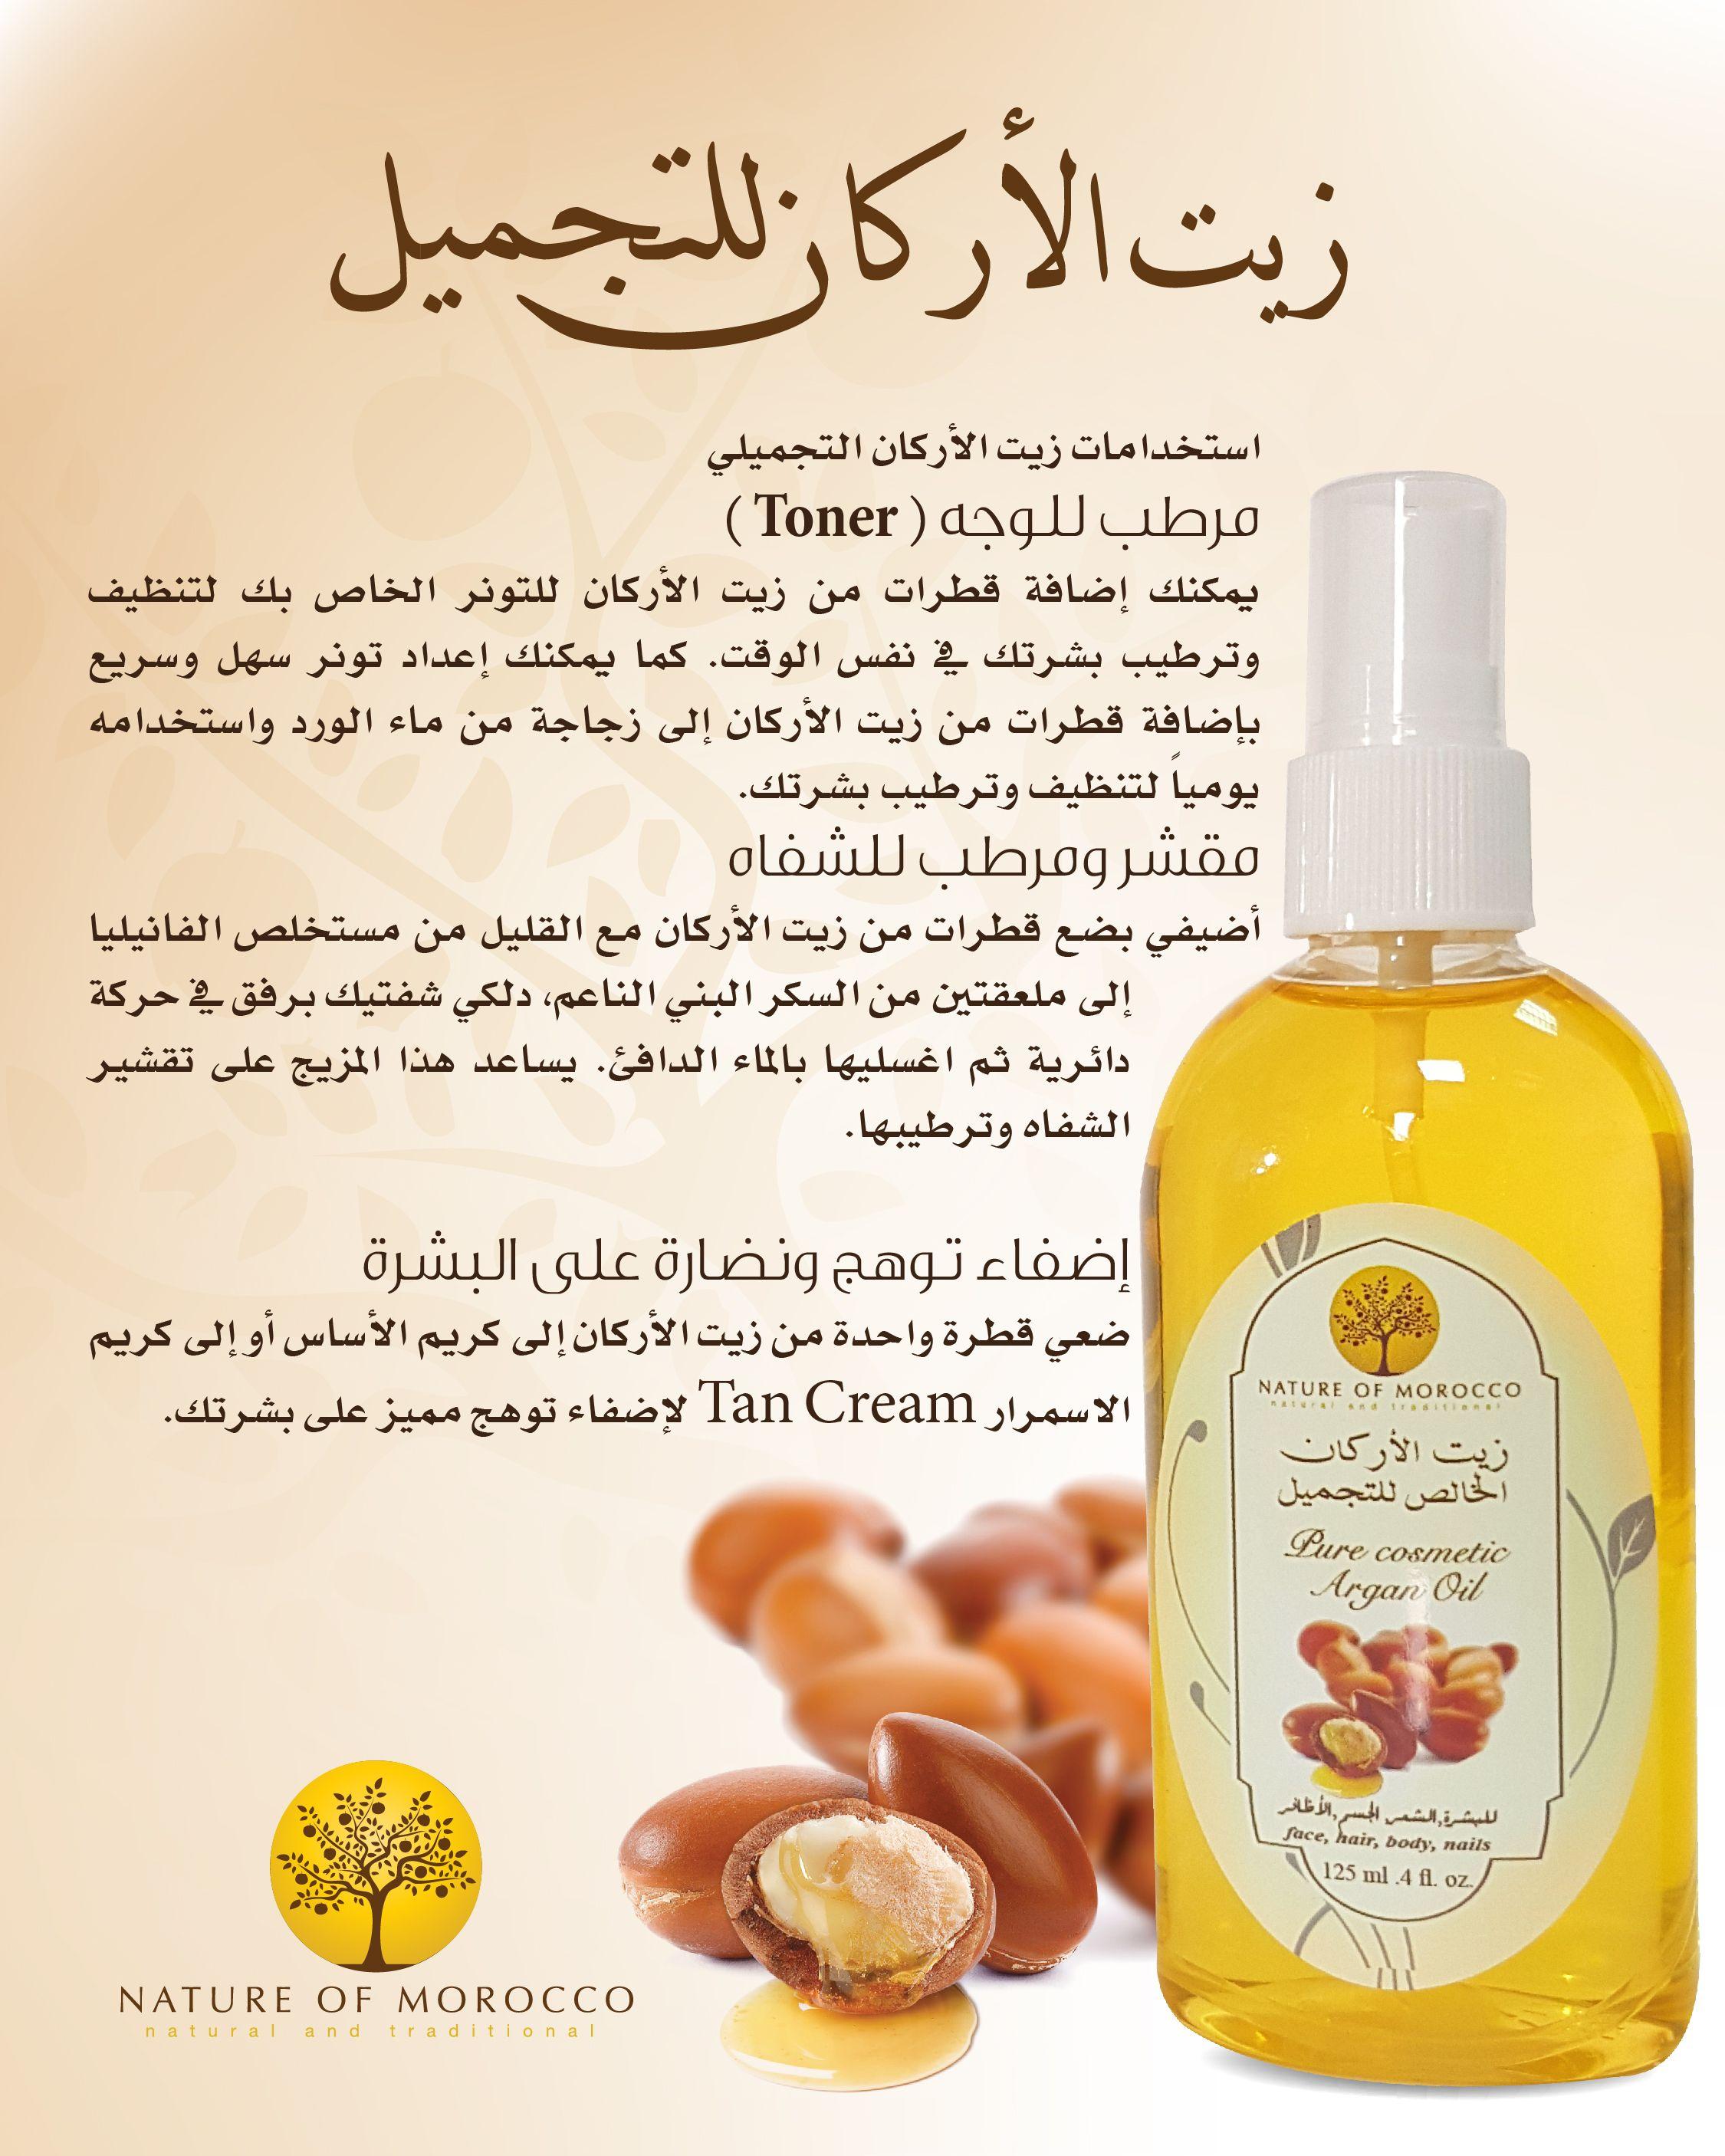 زيت الاركان زيت الارجان Argan Oil Saudi Arabia Riyadh Hair Care Oils Hair Care Recipes Face Products Skincare